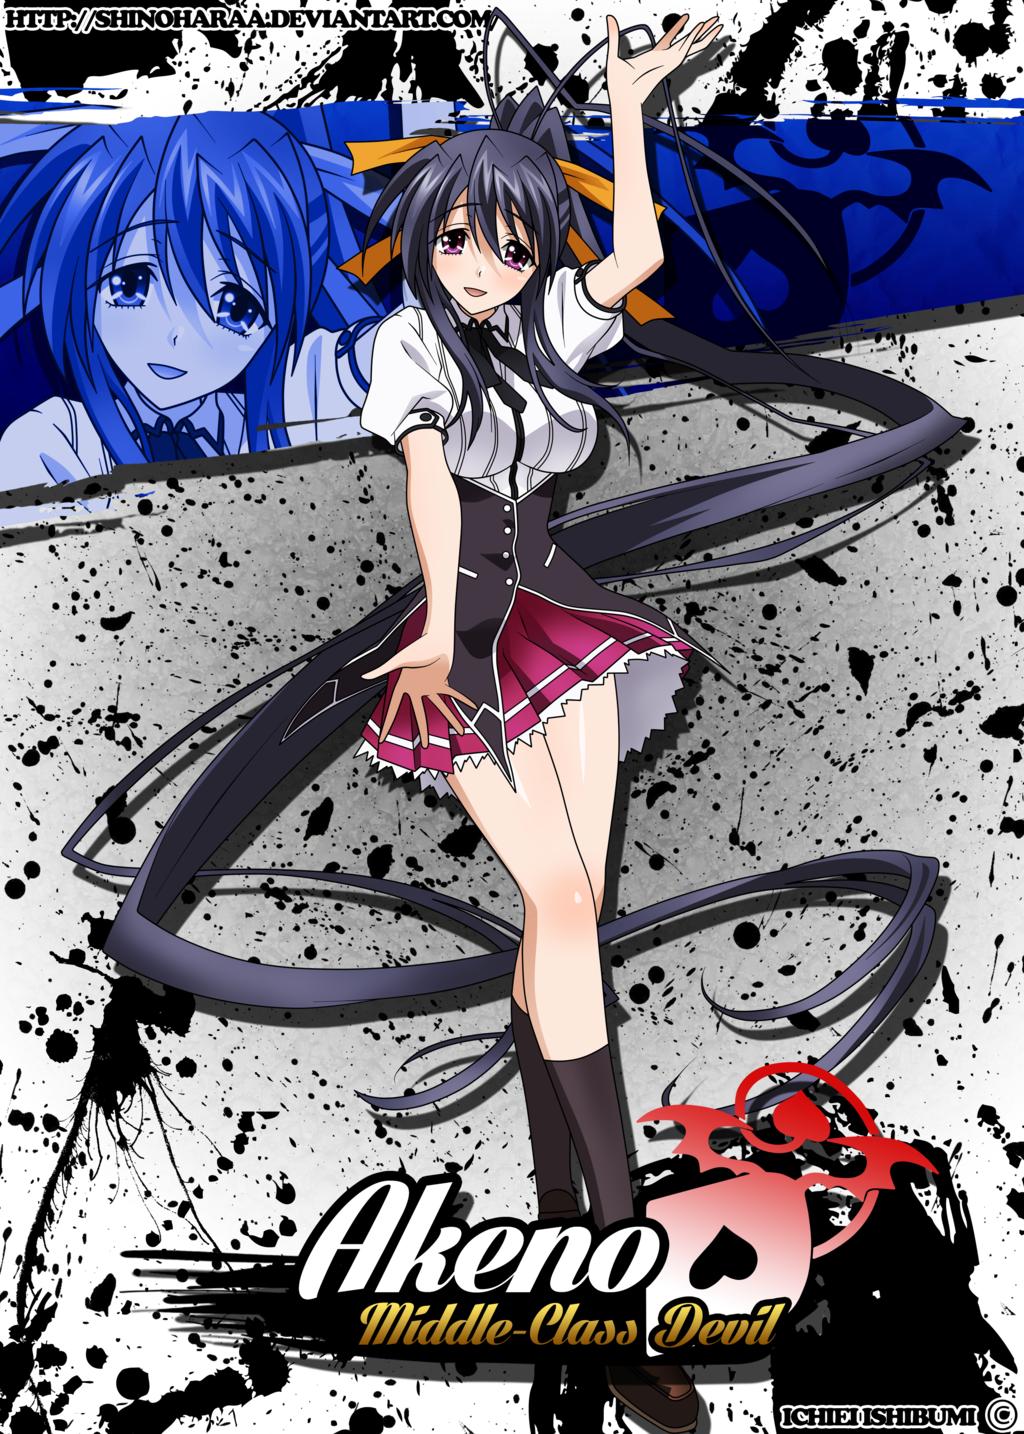 Akeno Himejima By Shinoharaa On Deviantart Anime High School Dxd Highschool Dxd